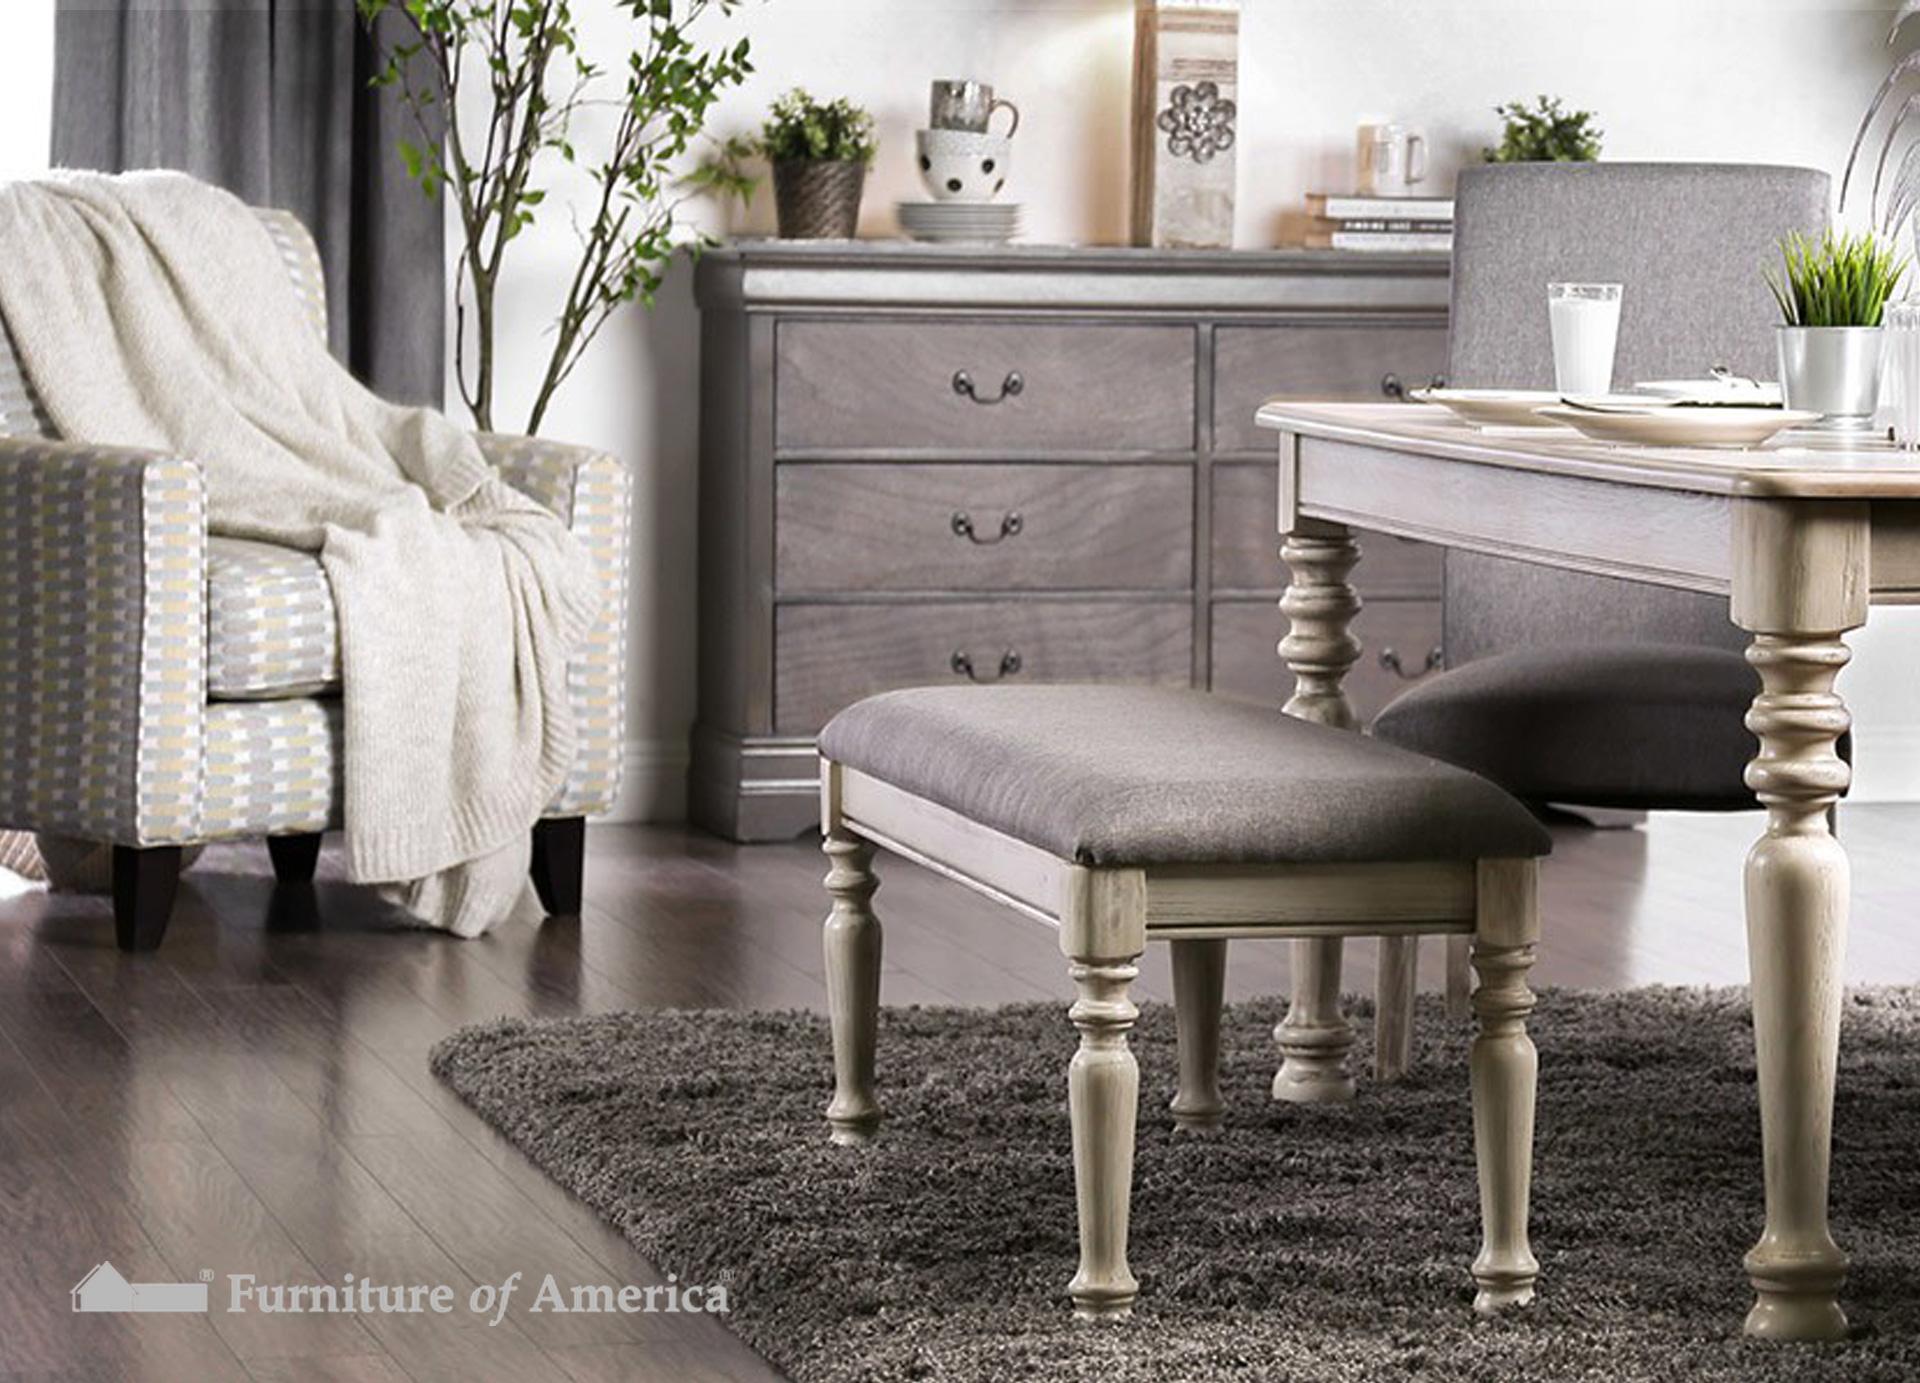 central-florida-fine-interiors-showroom-furniture-of-america